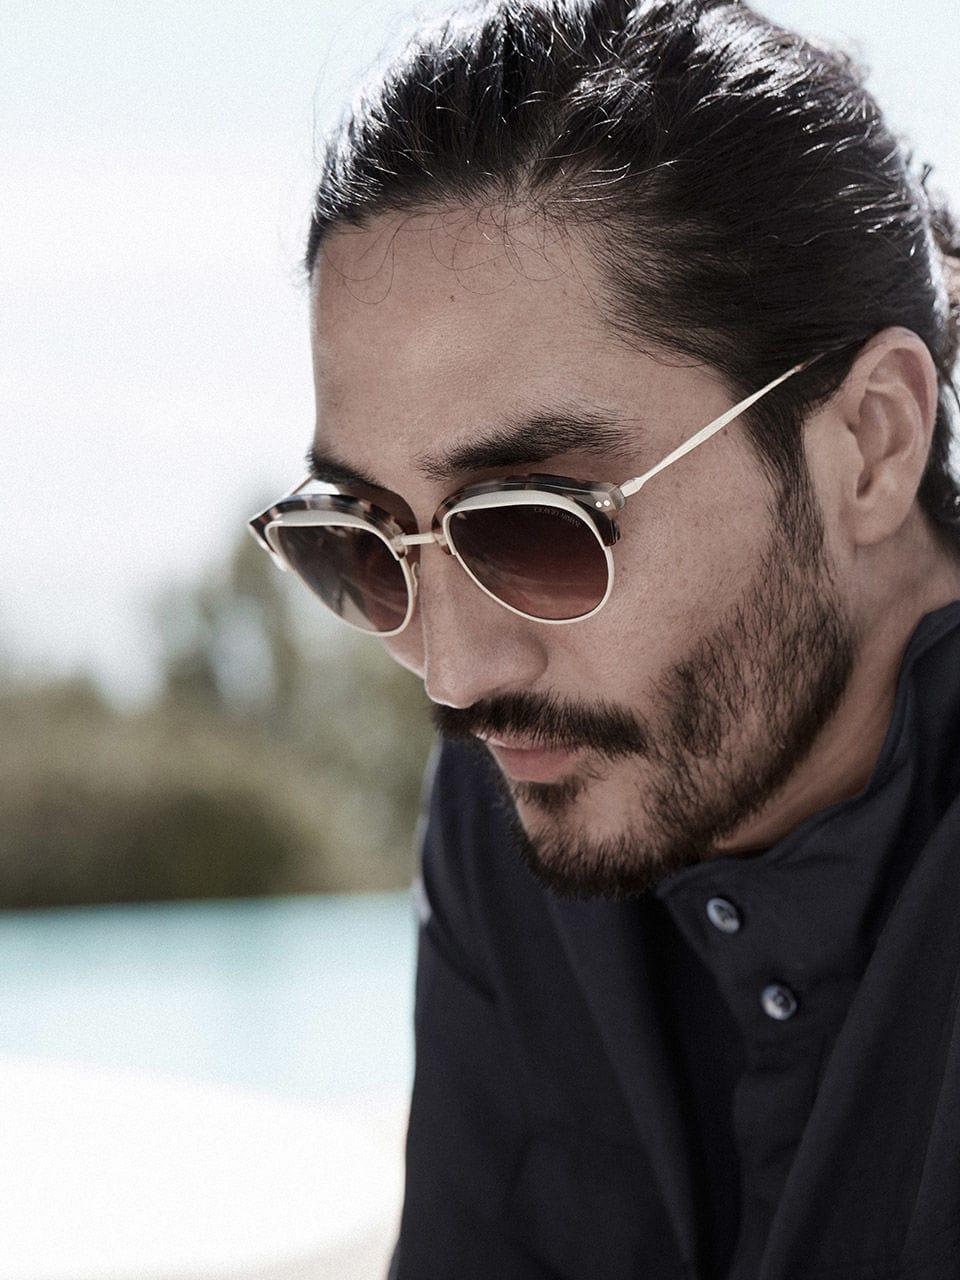 Giorgio_Armani_Eyewear_FW18_Santa_Ibiza_08.jpg